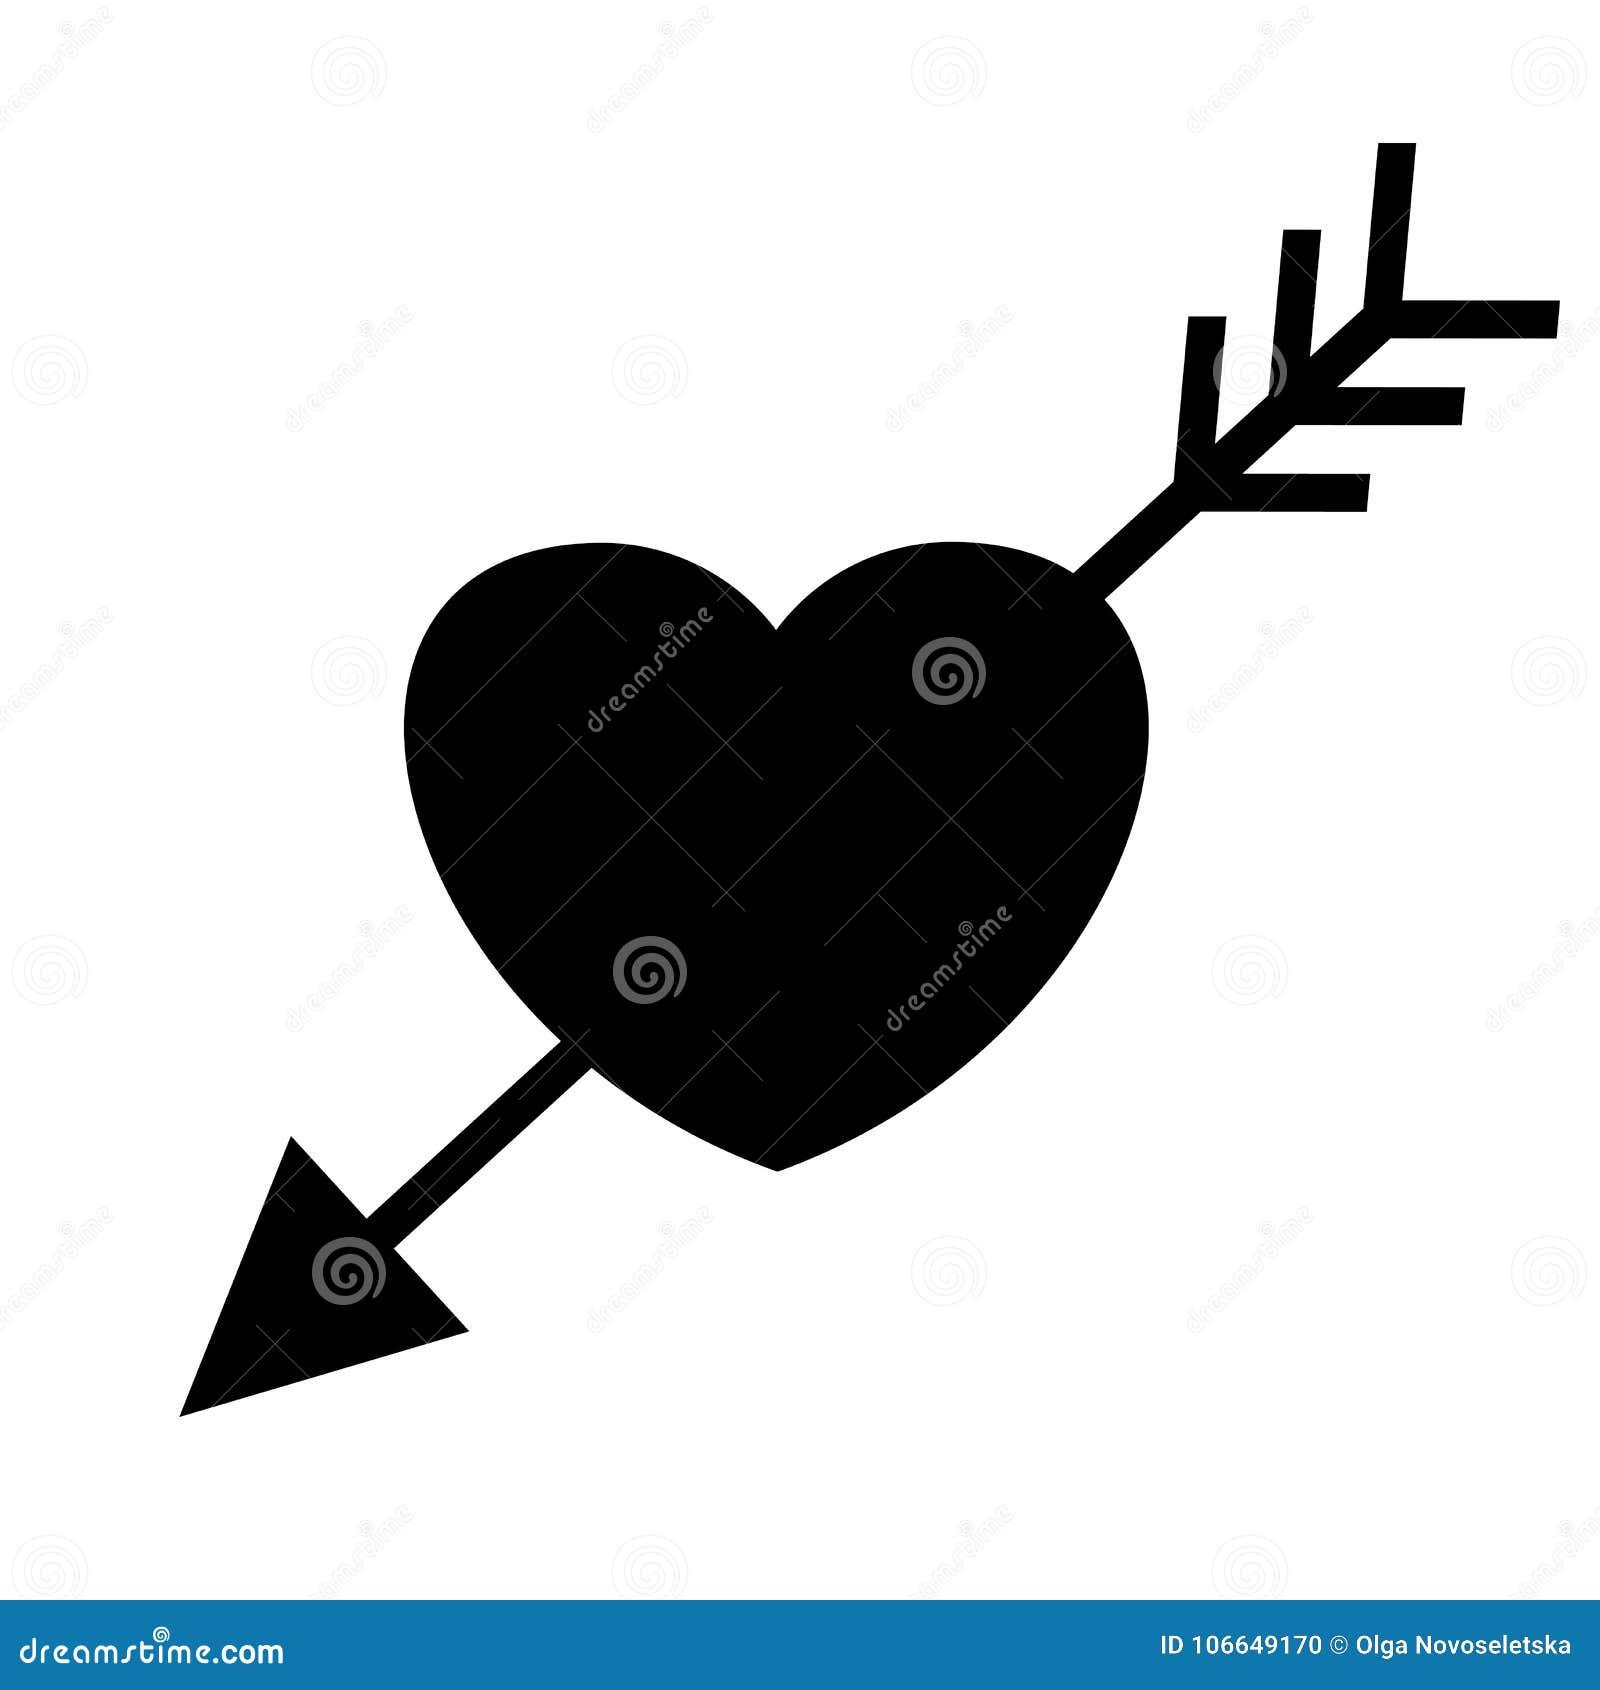 Wedding Heart With Arrow Black Icon Stock Vector Illustration Of